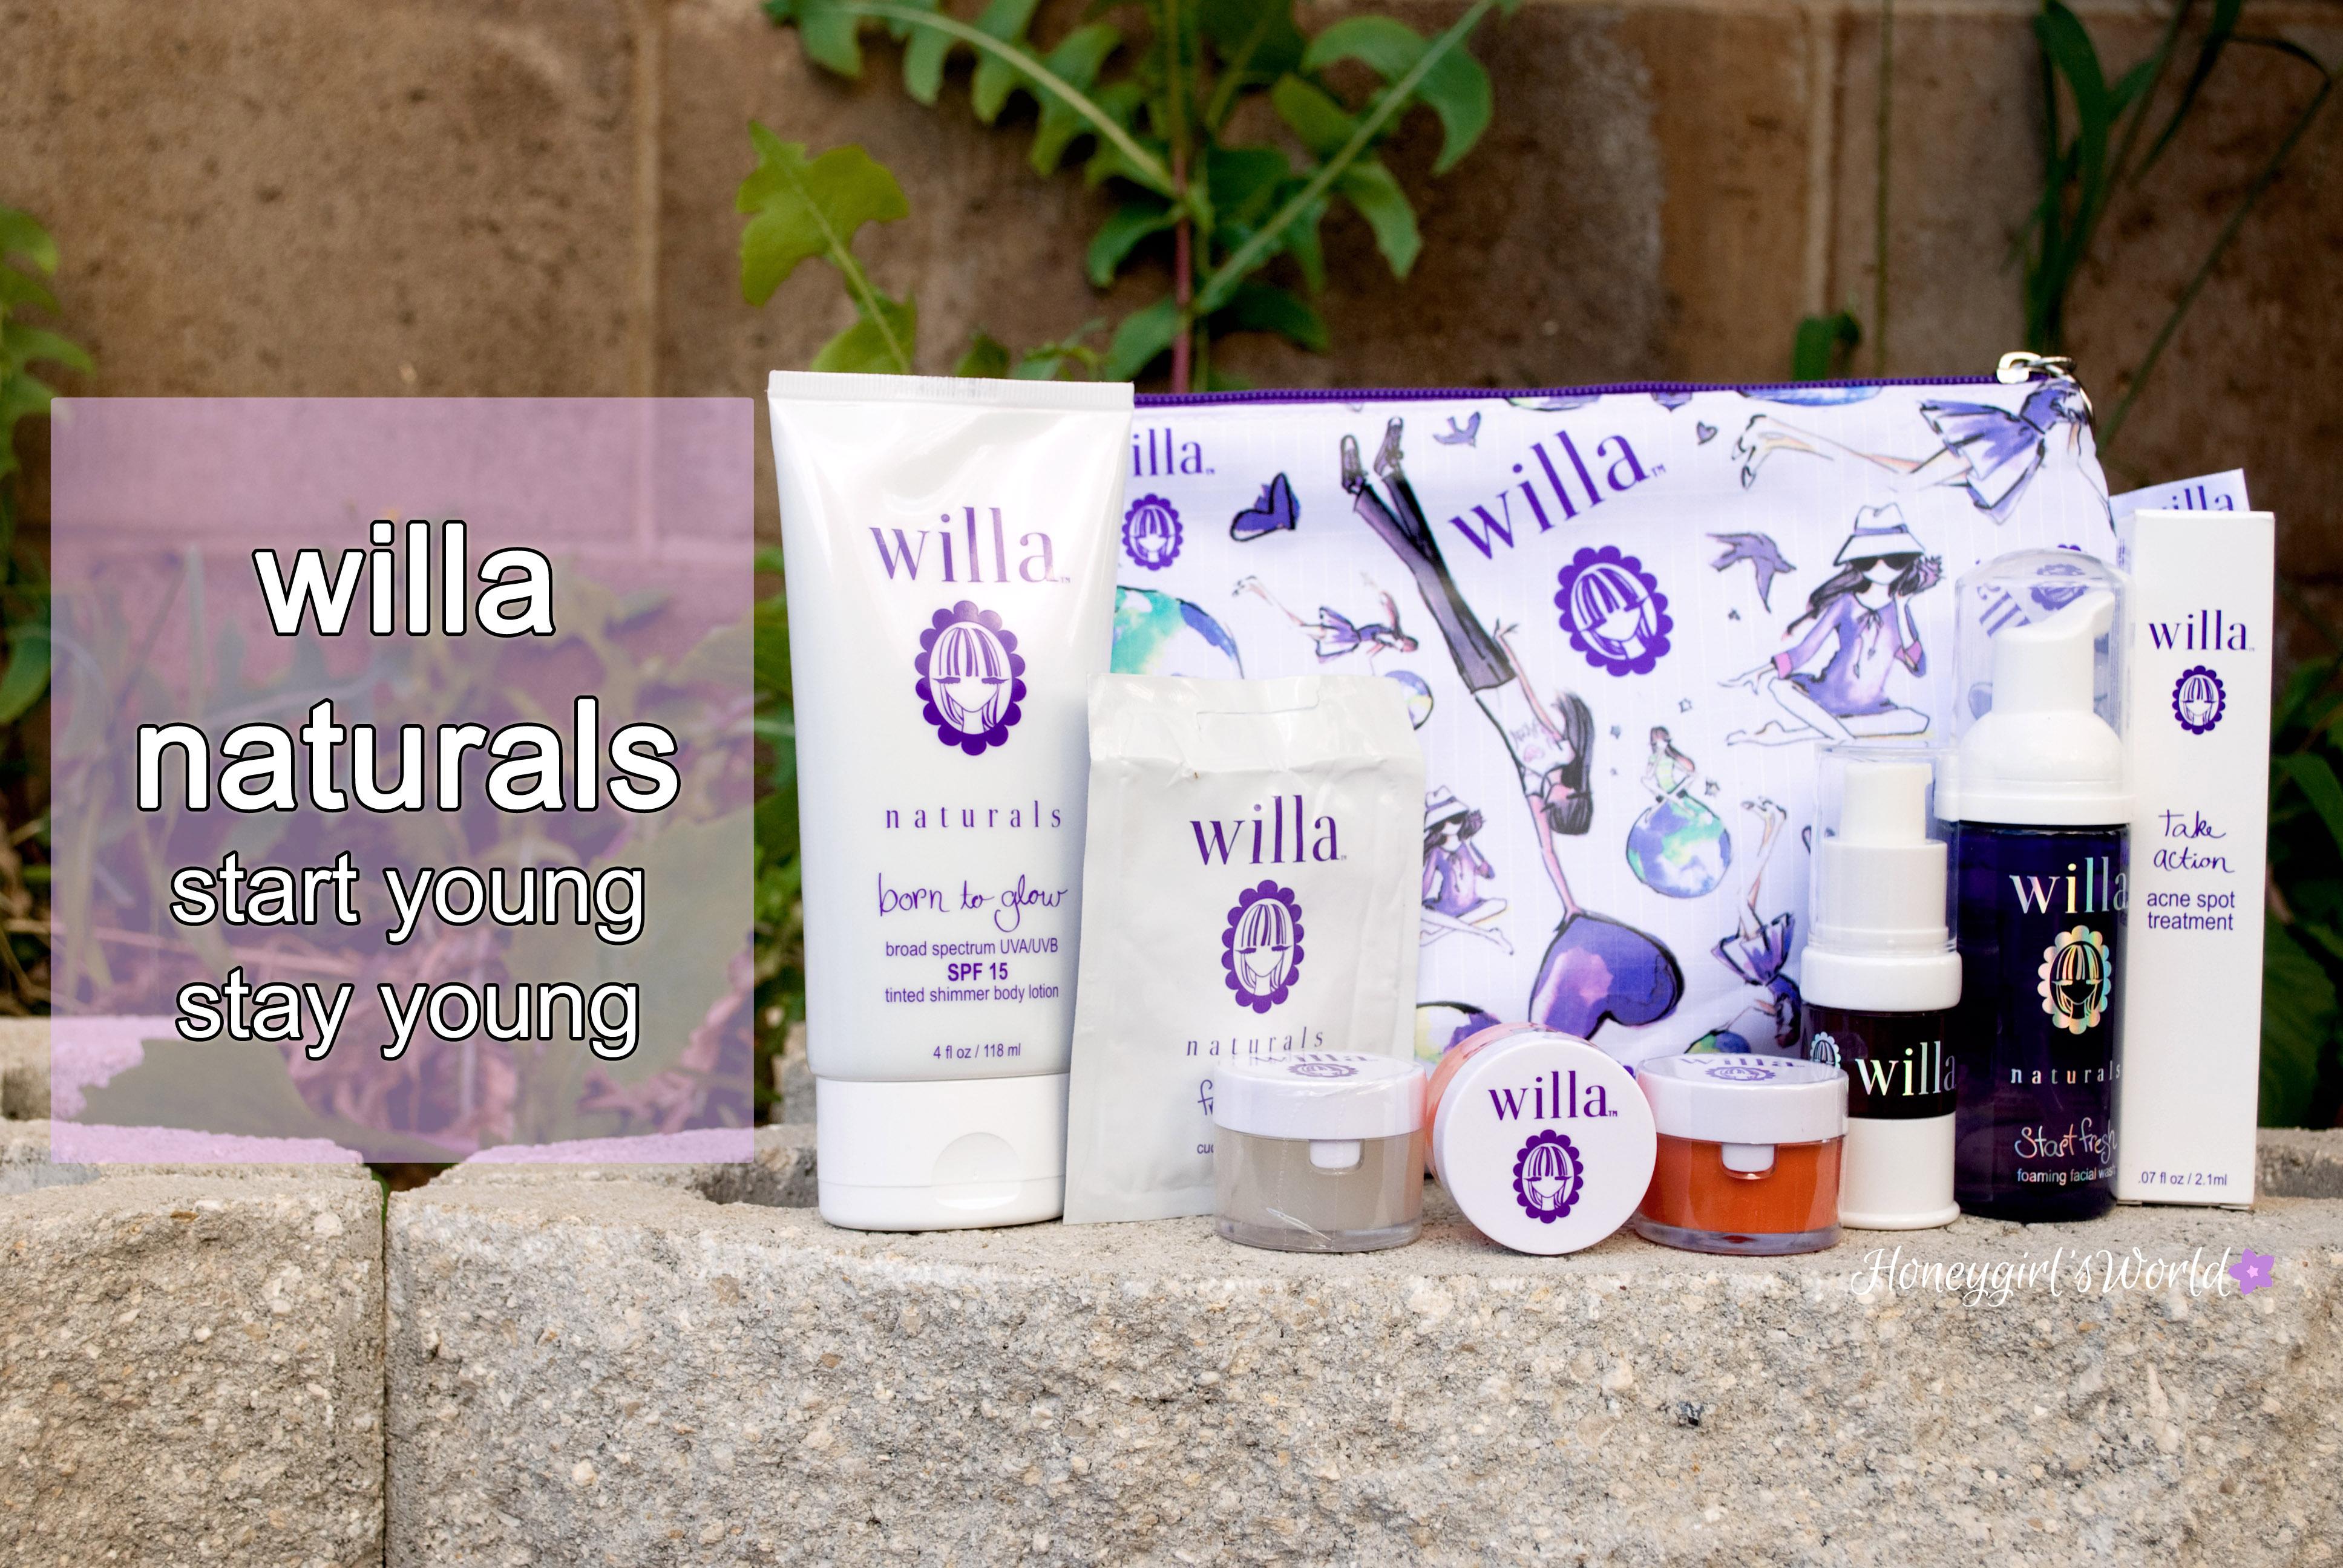 Willa naturals